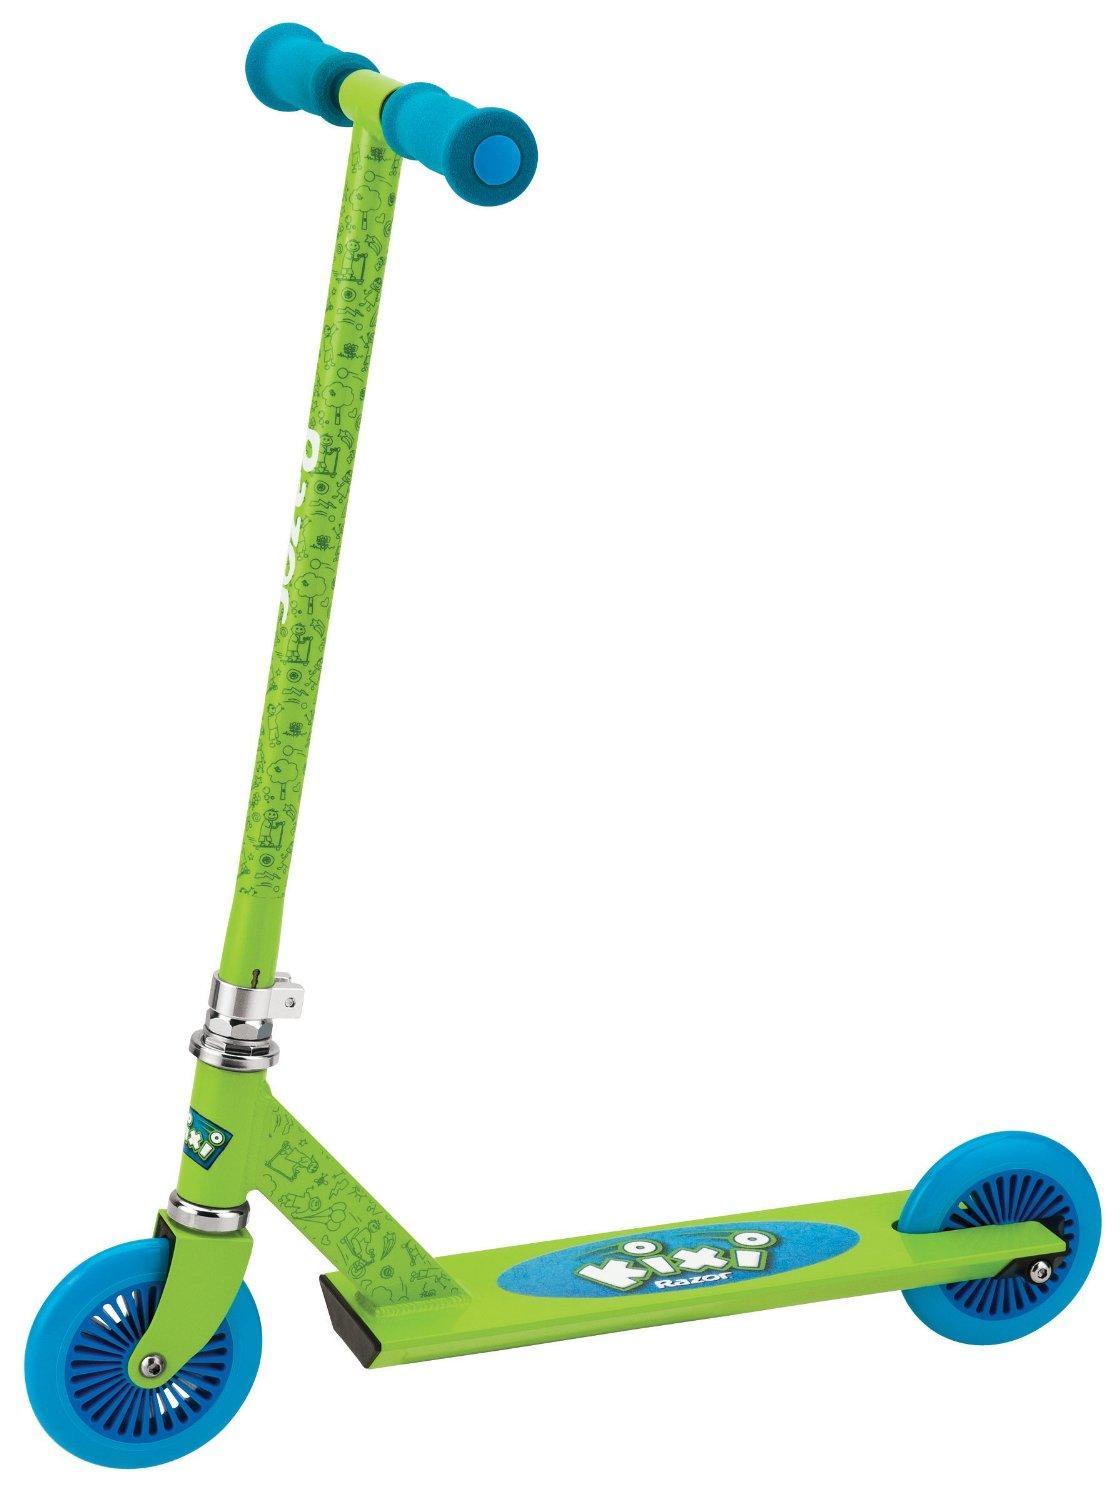 Giá bán Xe trượt Razor Kixi Mixi Scooter (Xanh)